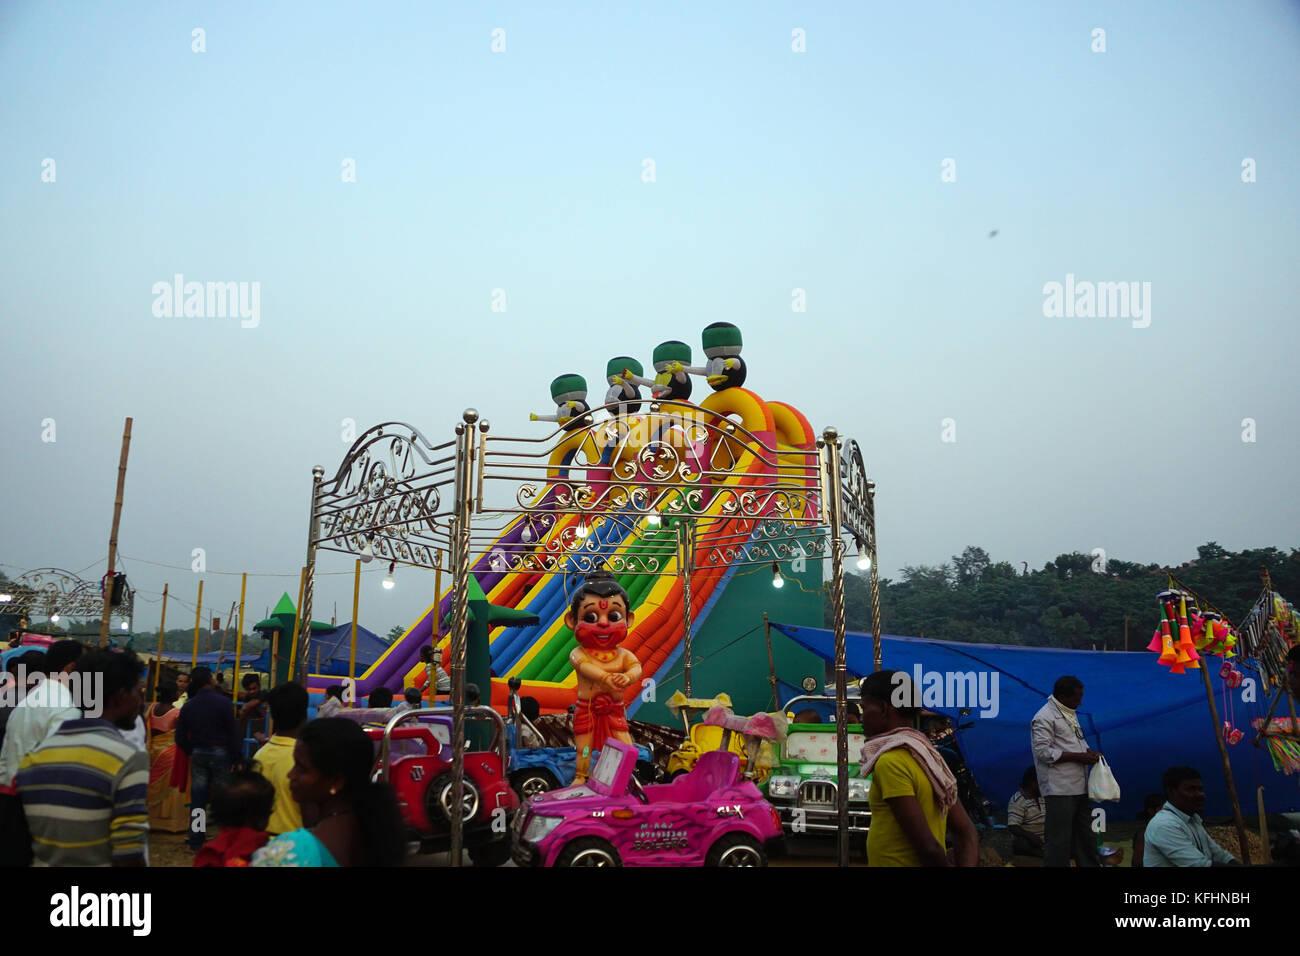 Chaibasa, Jharkhand, India, 29th October 2017: The Ferris wheel, dragon-coaster ride of amusement Park in Gaushala - Stock Image